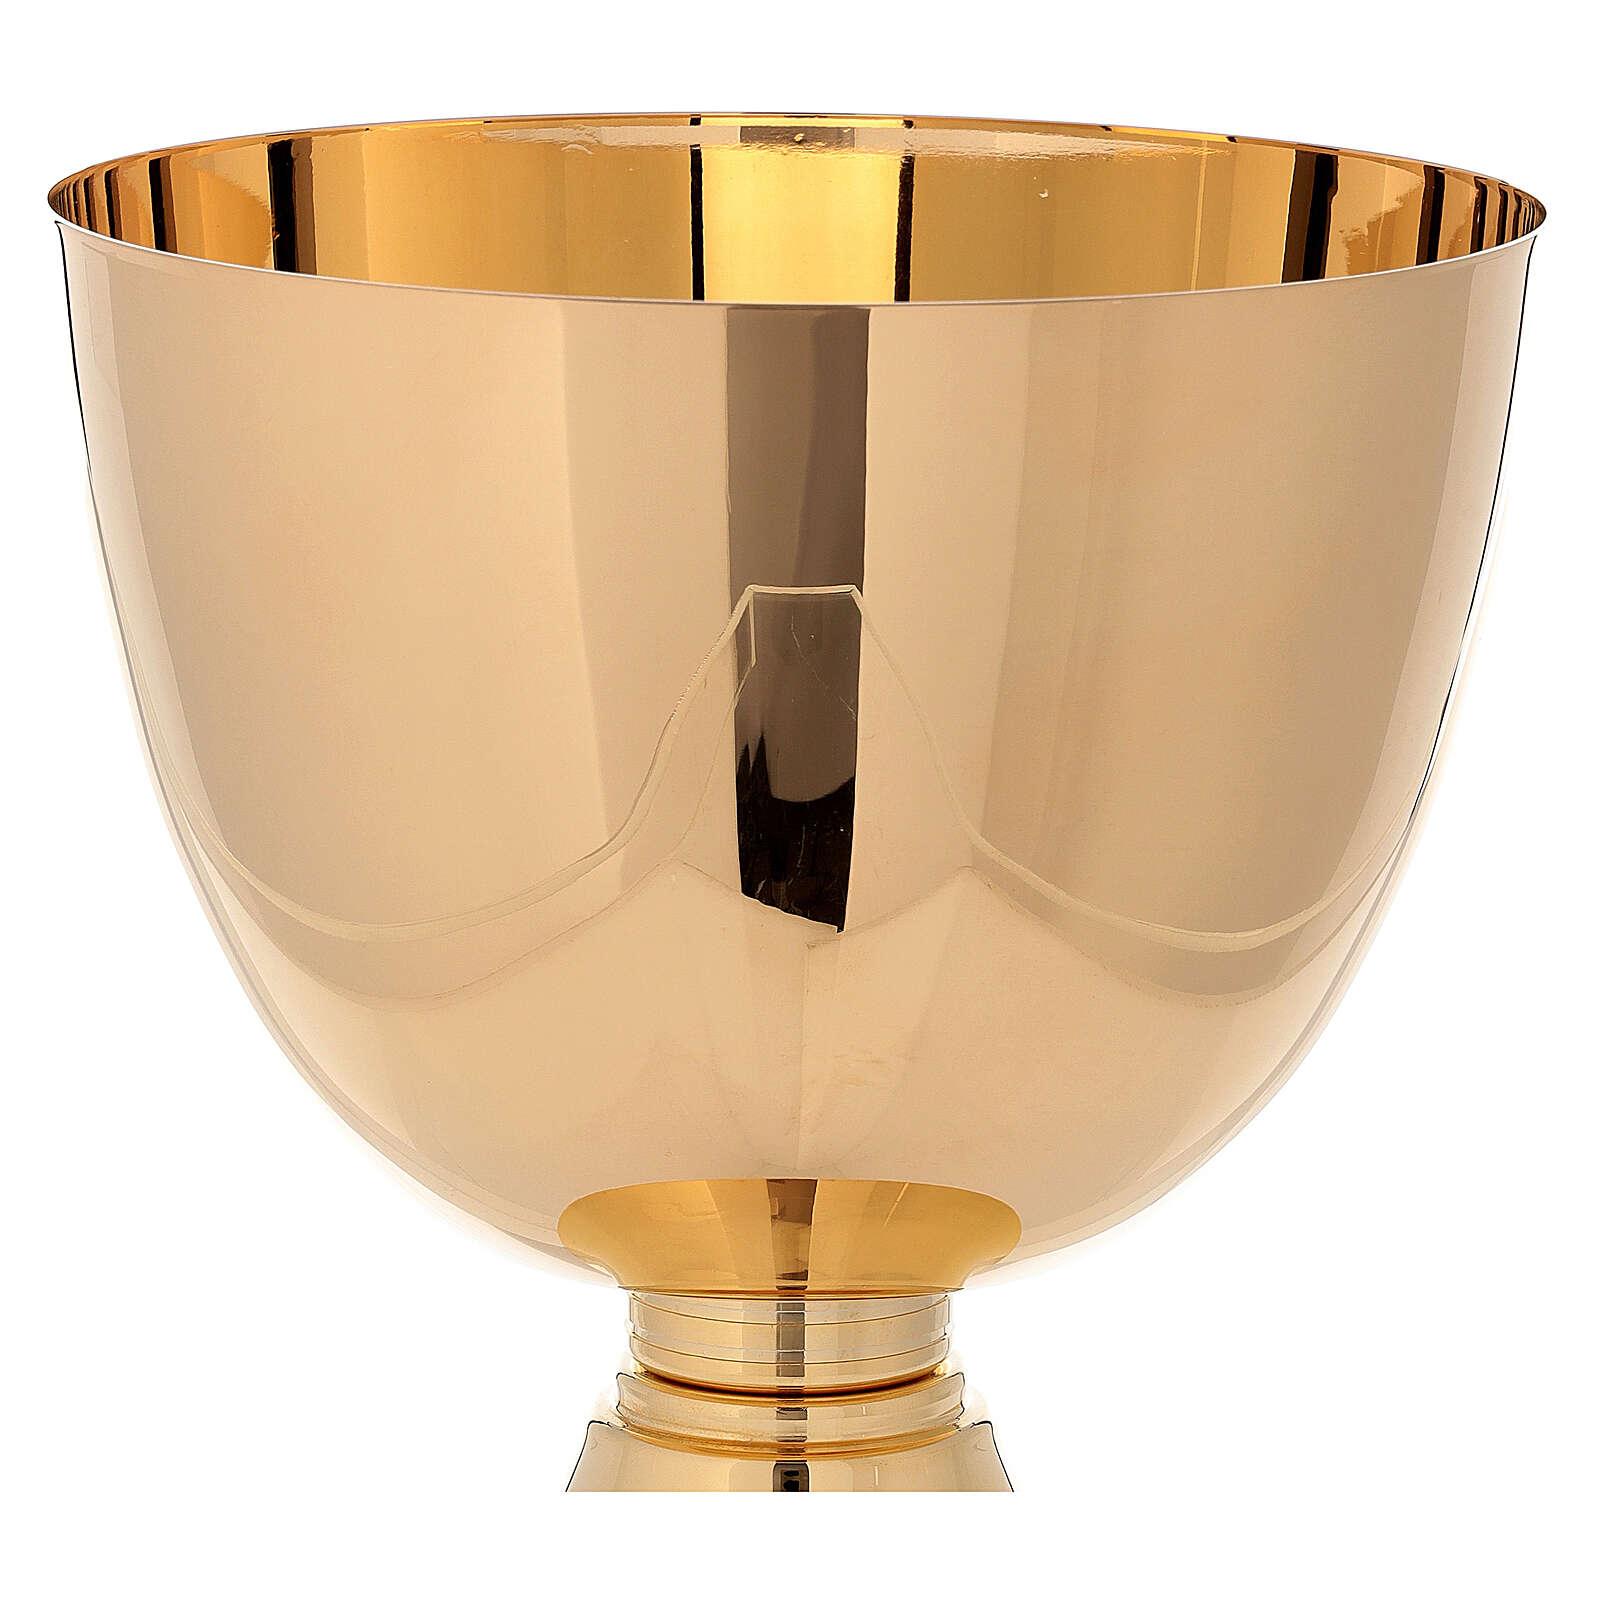 Chalice Concelebration 24-karat gold plated brass simple base 750 ml 4